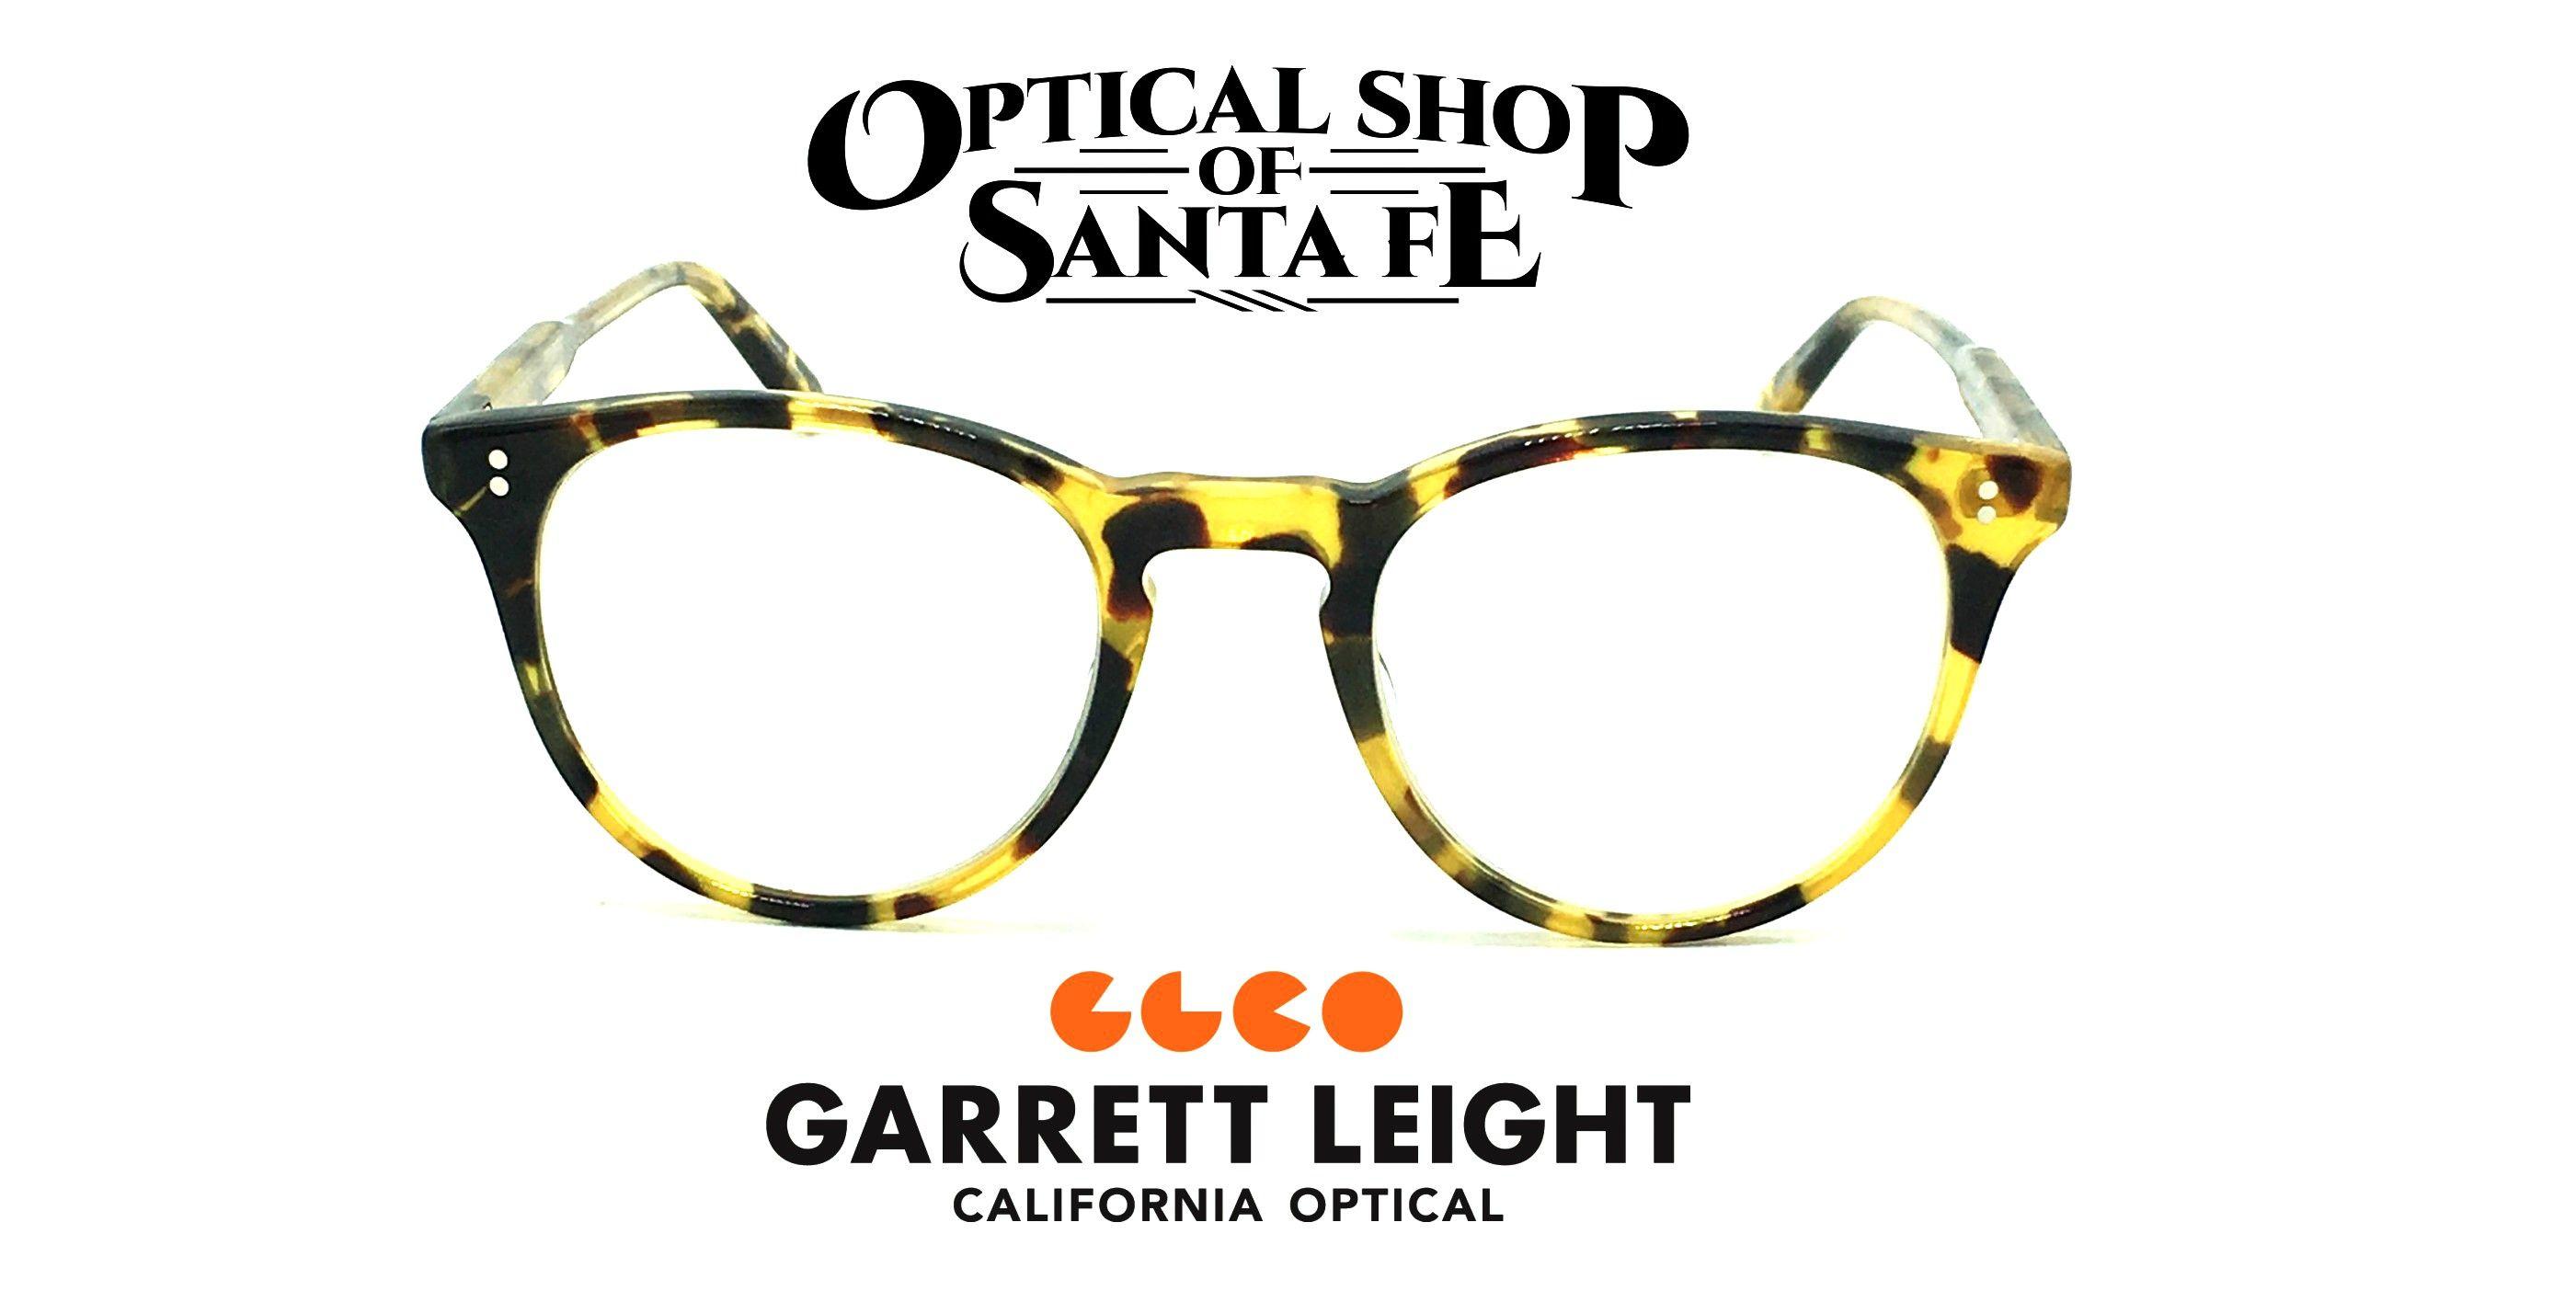 Garrett Leight California Optical (GLCO) Optical Frame